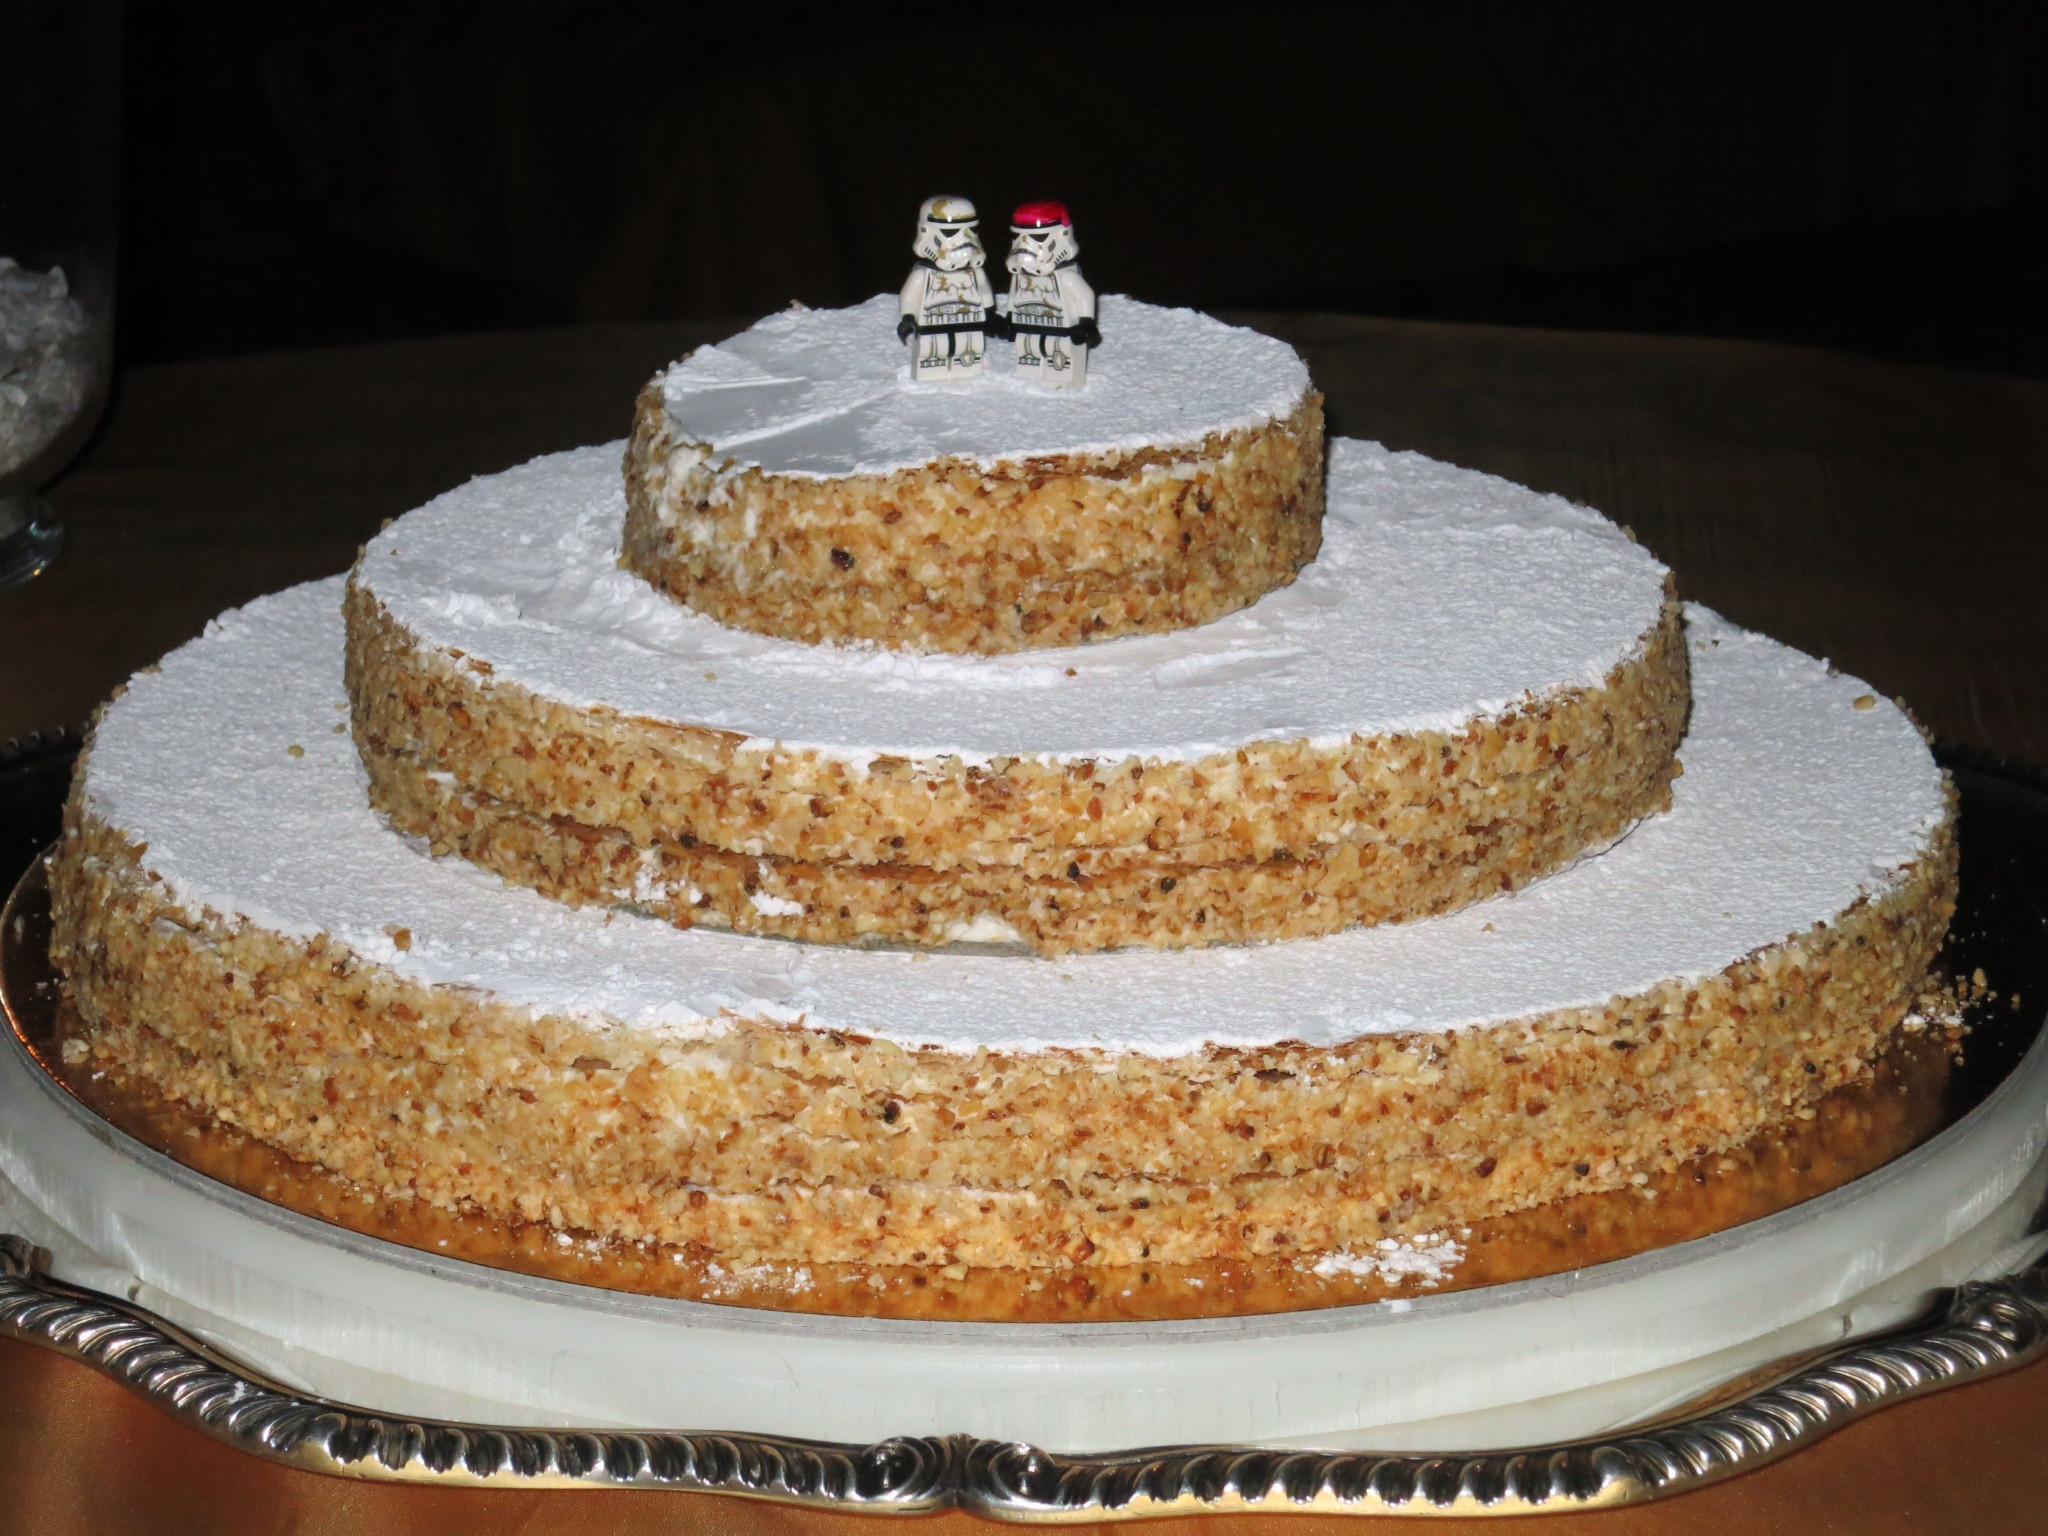 Italian Wedding Cakes  Wedding Planning in Italy the right cake